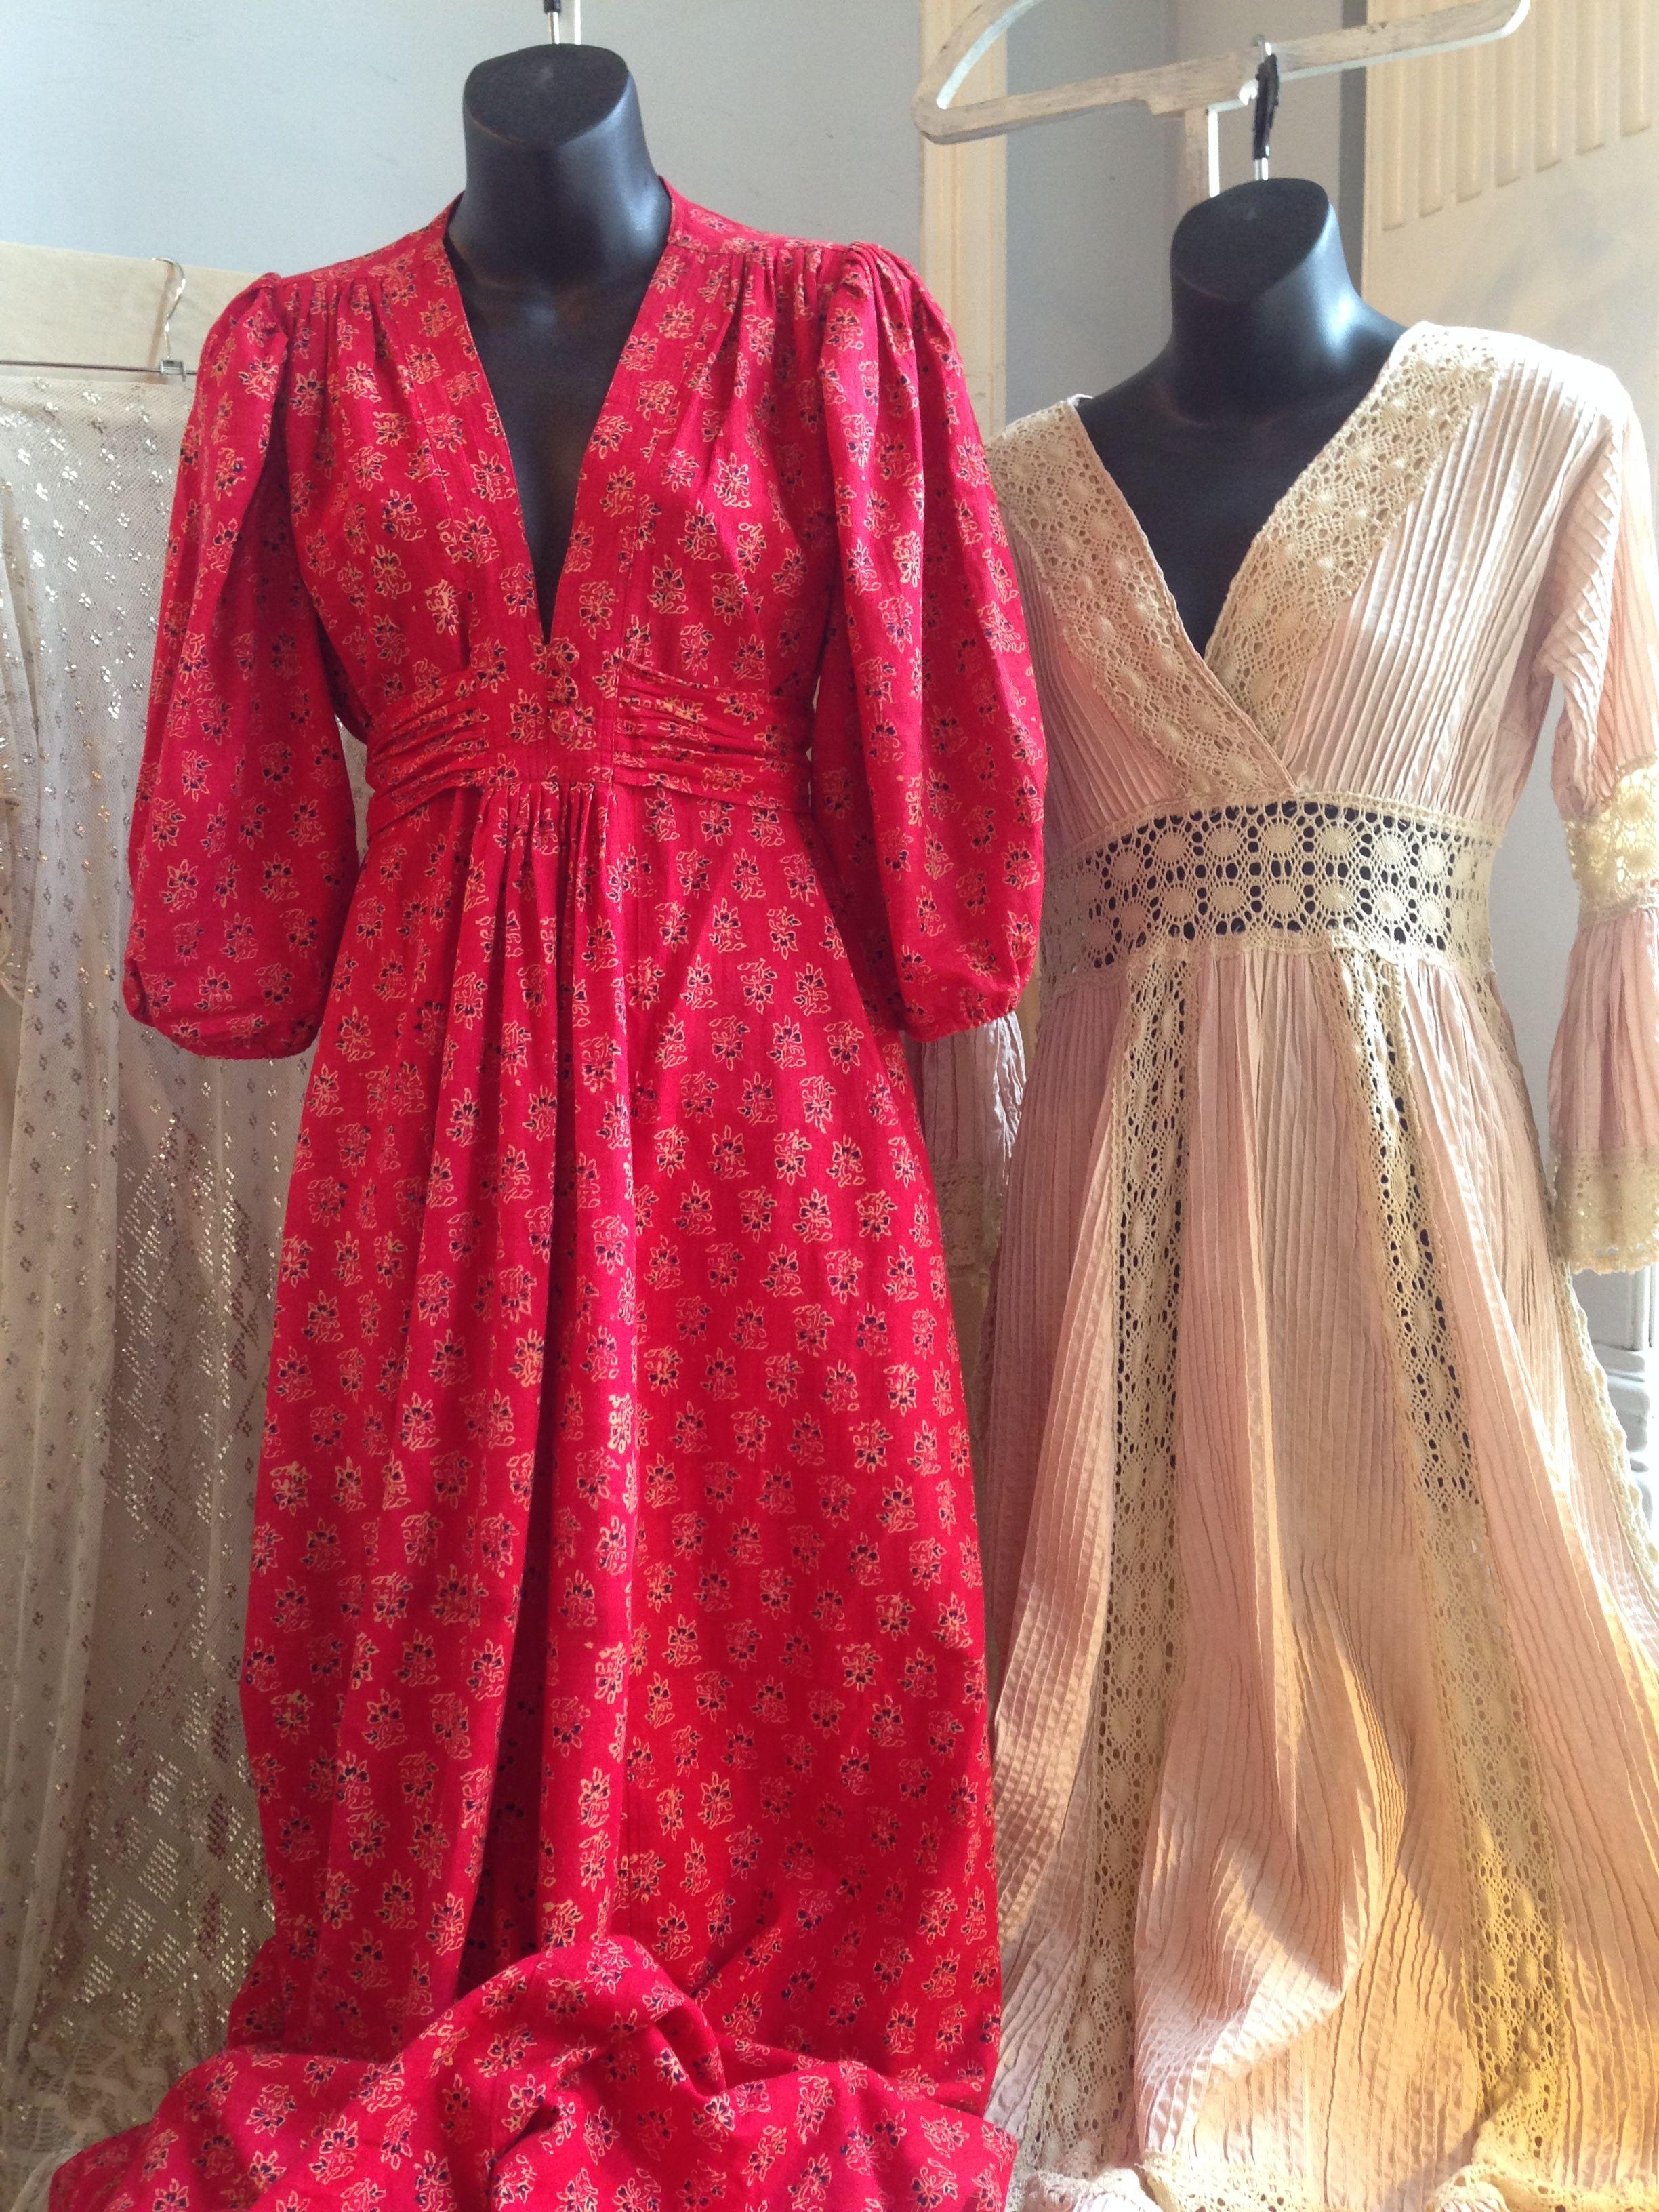 Frock Me Vintage Fair Chelsea London 2015 Clothing And Textile Vintage Tops Vintage Outfits